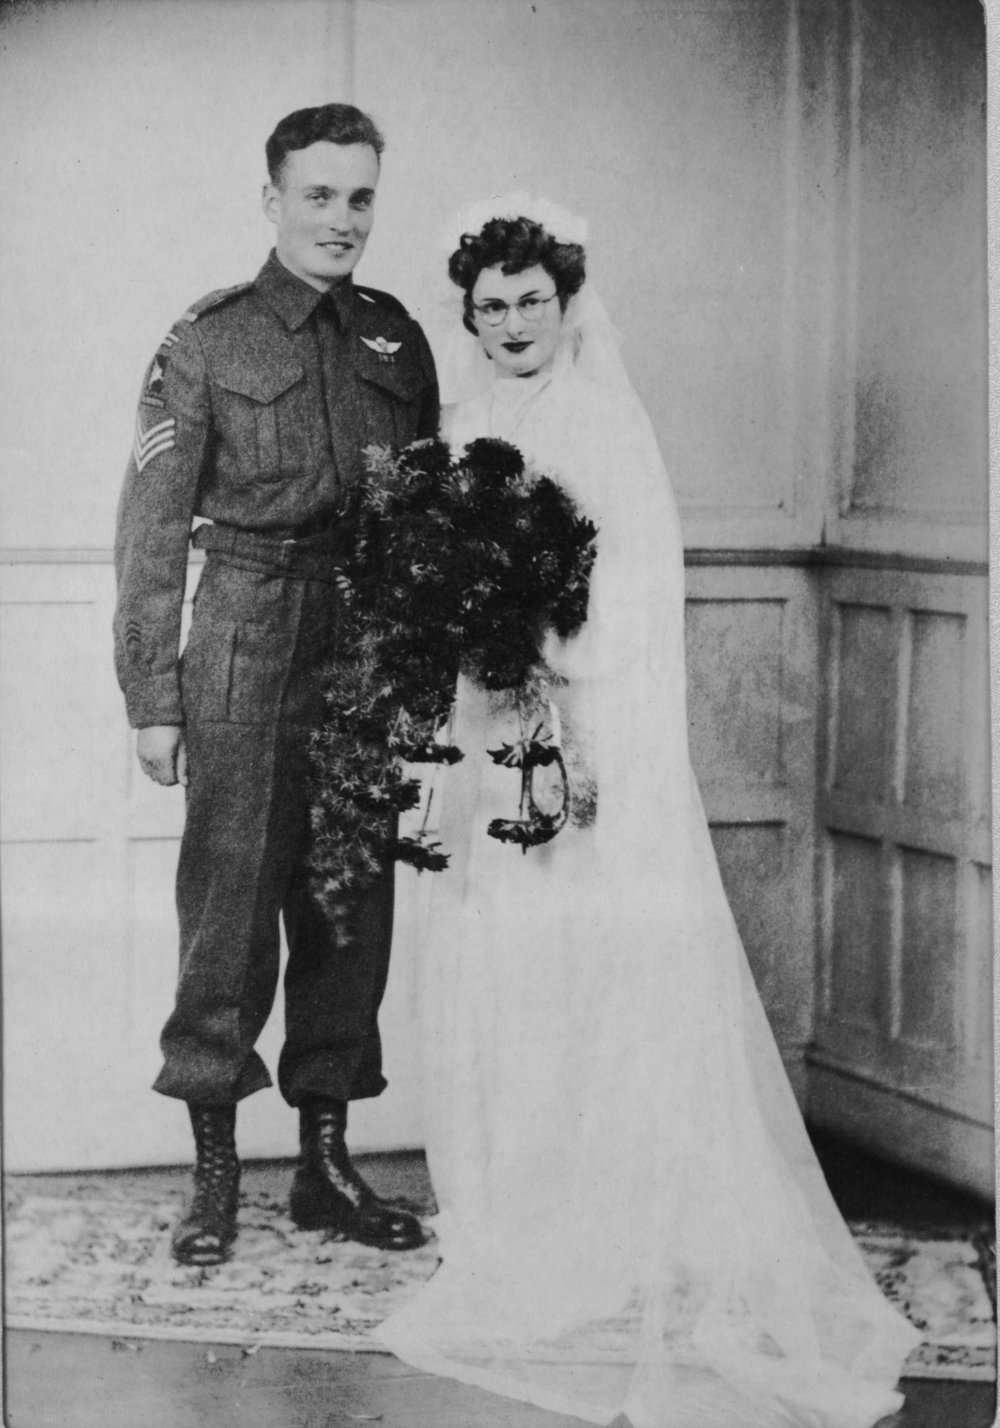 c. 1944. Wedding photo of Bruce Blagborne and Doiran Phillips.